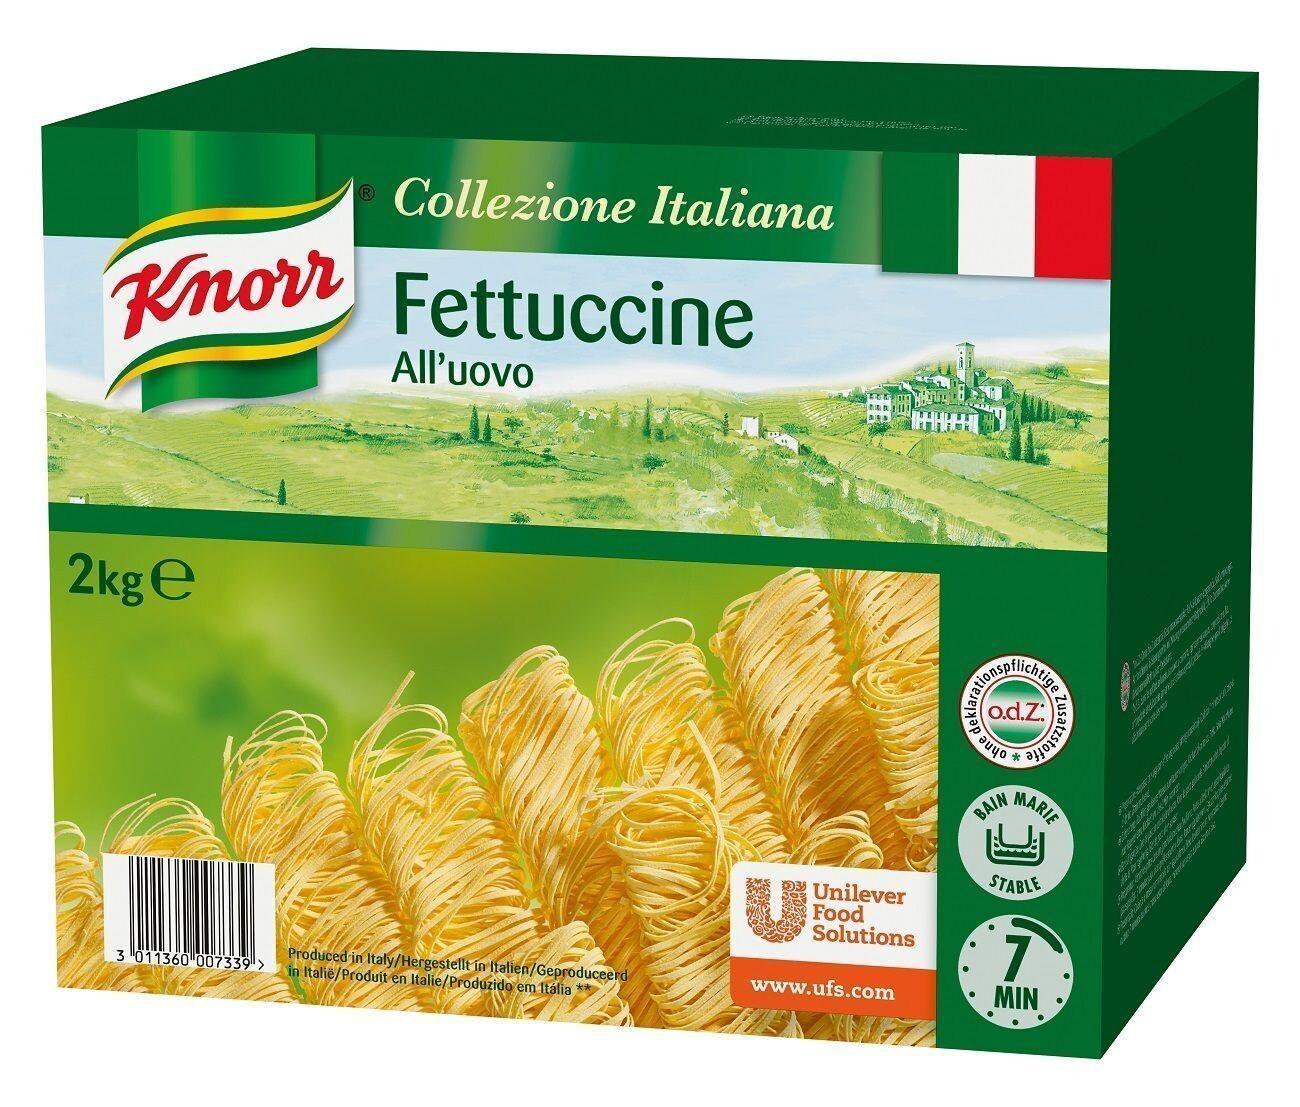 Fresh Egg Fettucine 2kg Knorr Collezione Italiana Pasta